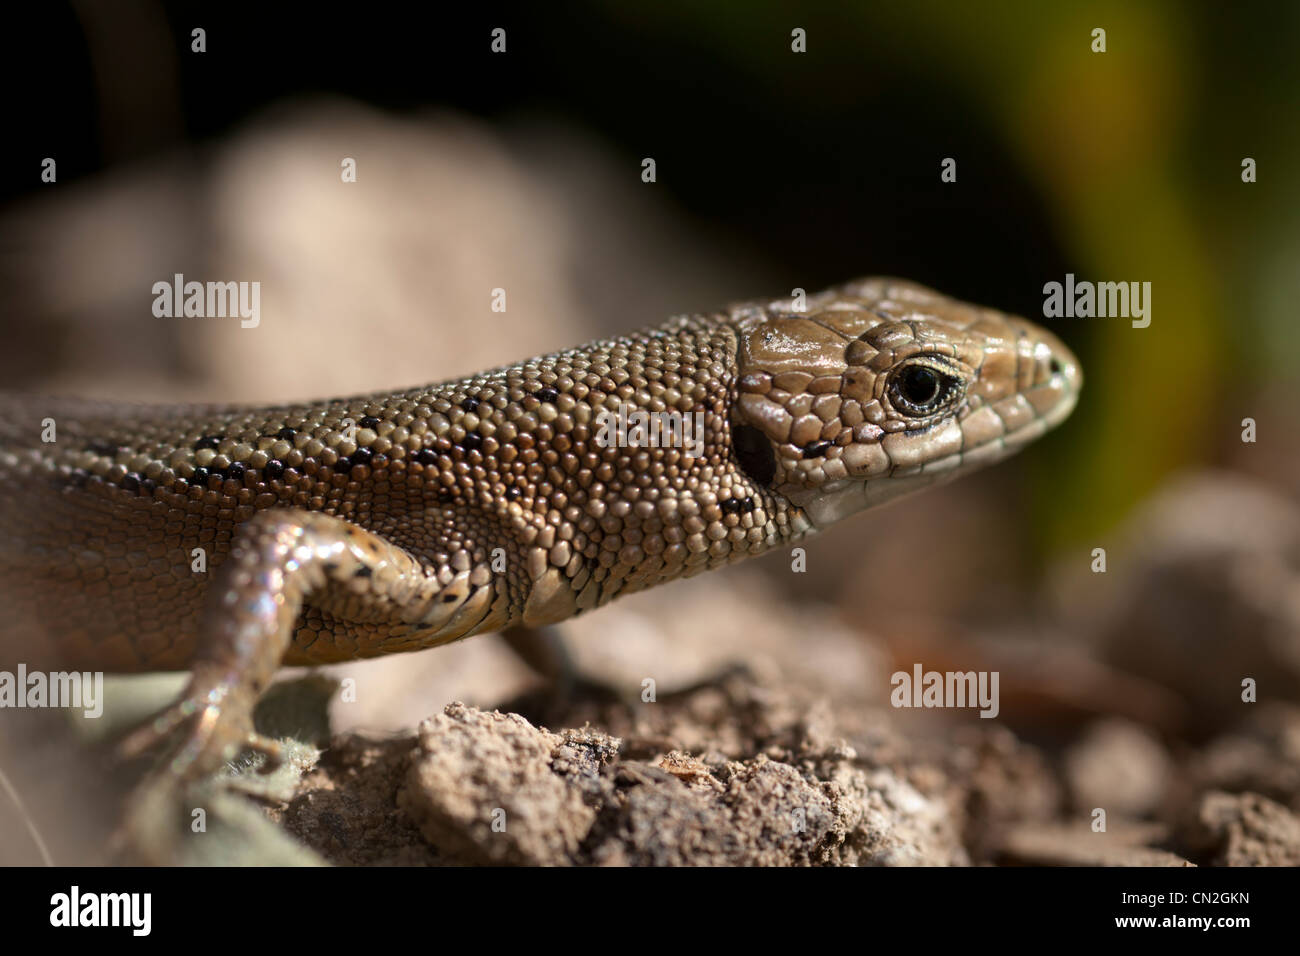 Gemeinsame oder Vivparous Eidechse (Zootoca Vivipara) Stockfoto